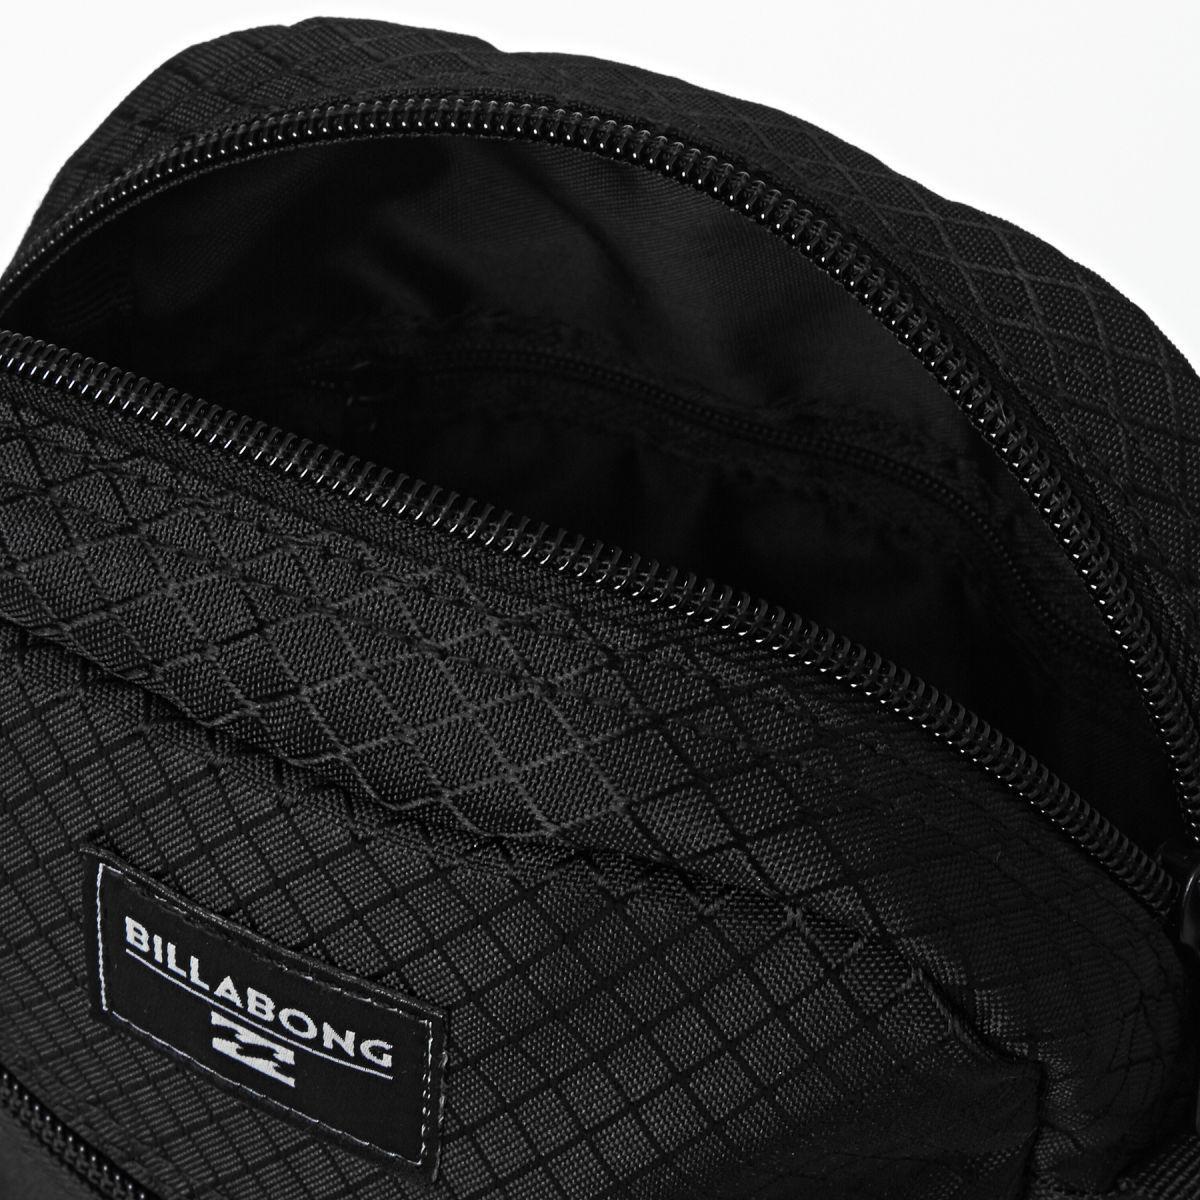 Billabong Men s Boulevard Cross Body Camera Shoulder Bag for sale ... 5e0559ba2449e